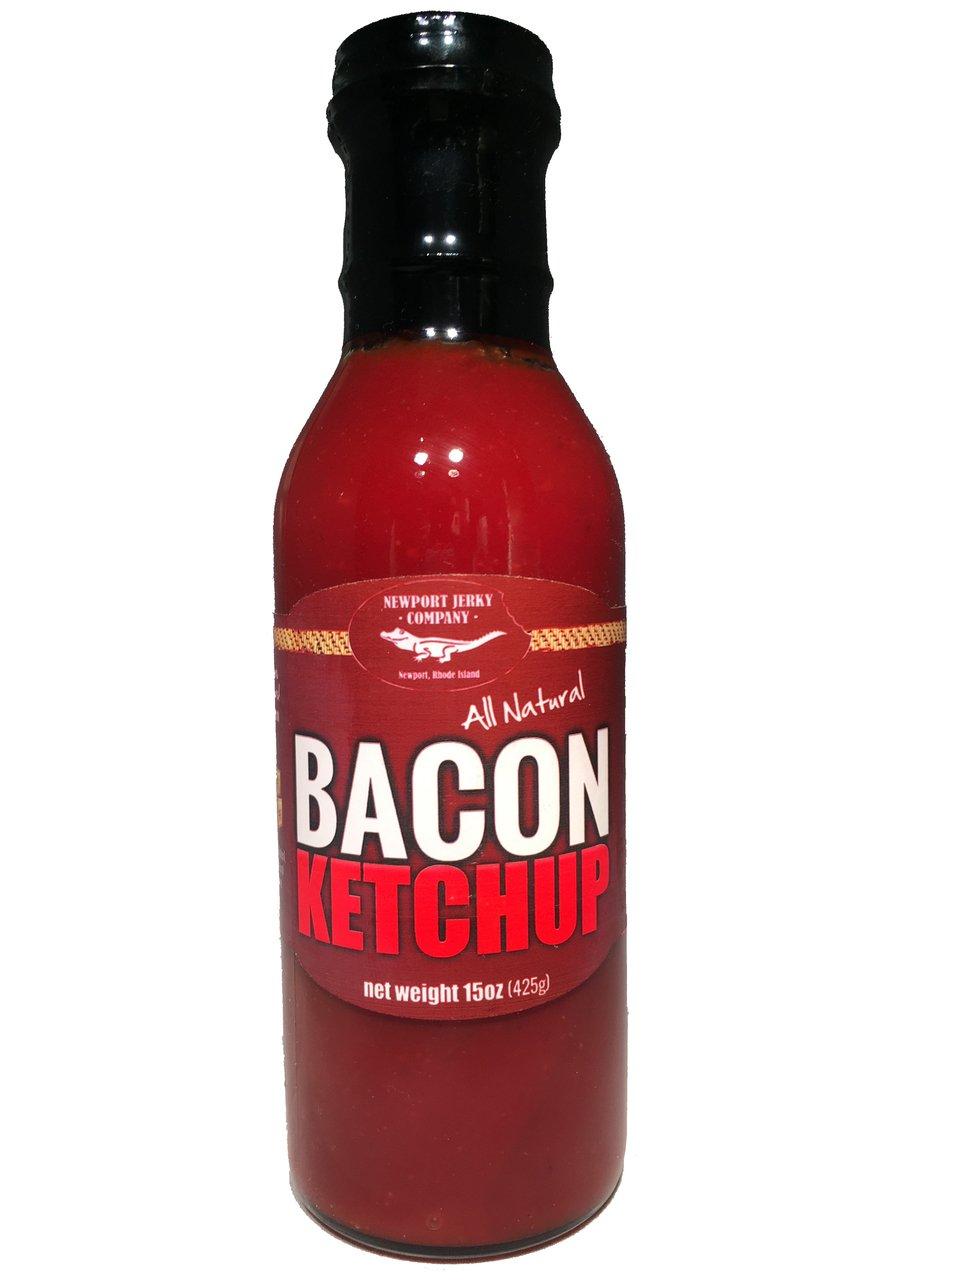 All Natural Bacon Ketchup by Newport Jerky Company